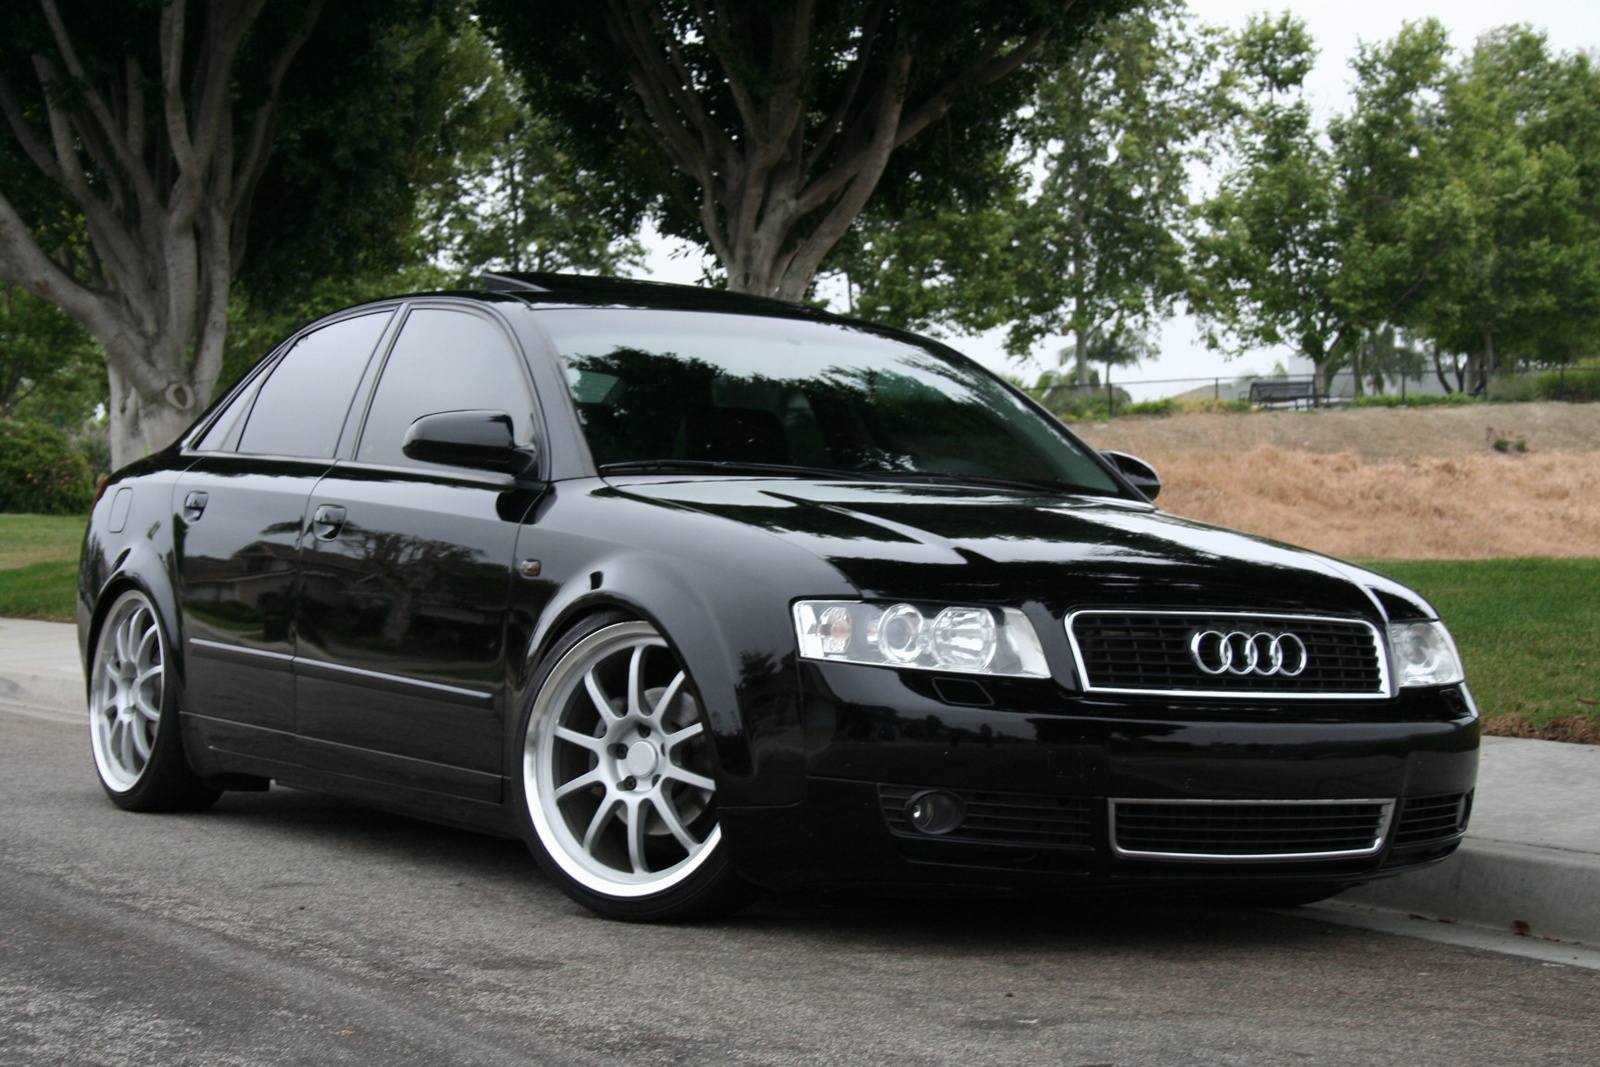 2003 Audi A4 Image 2